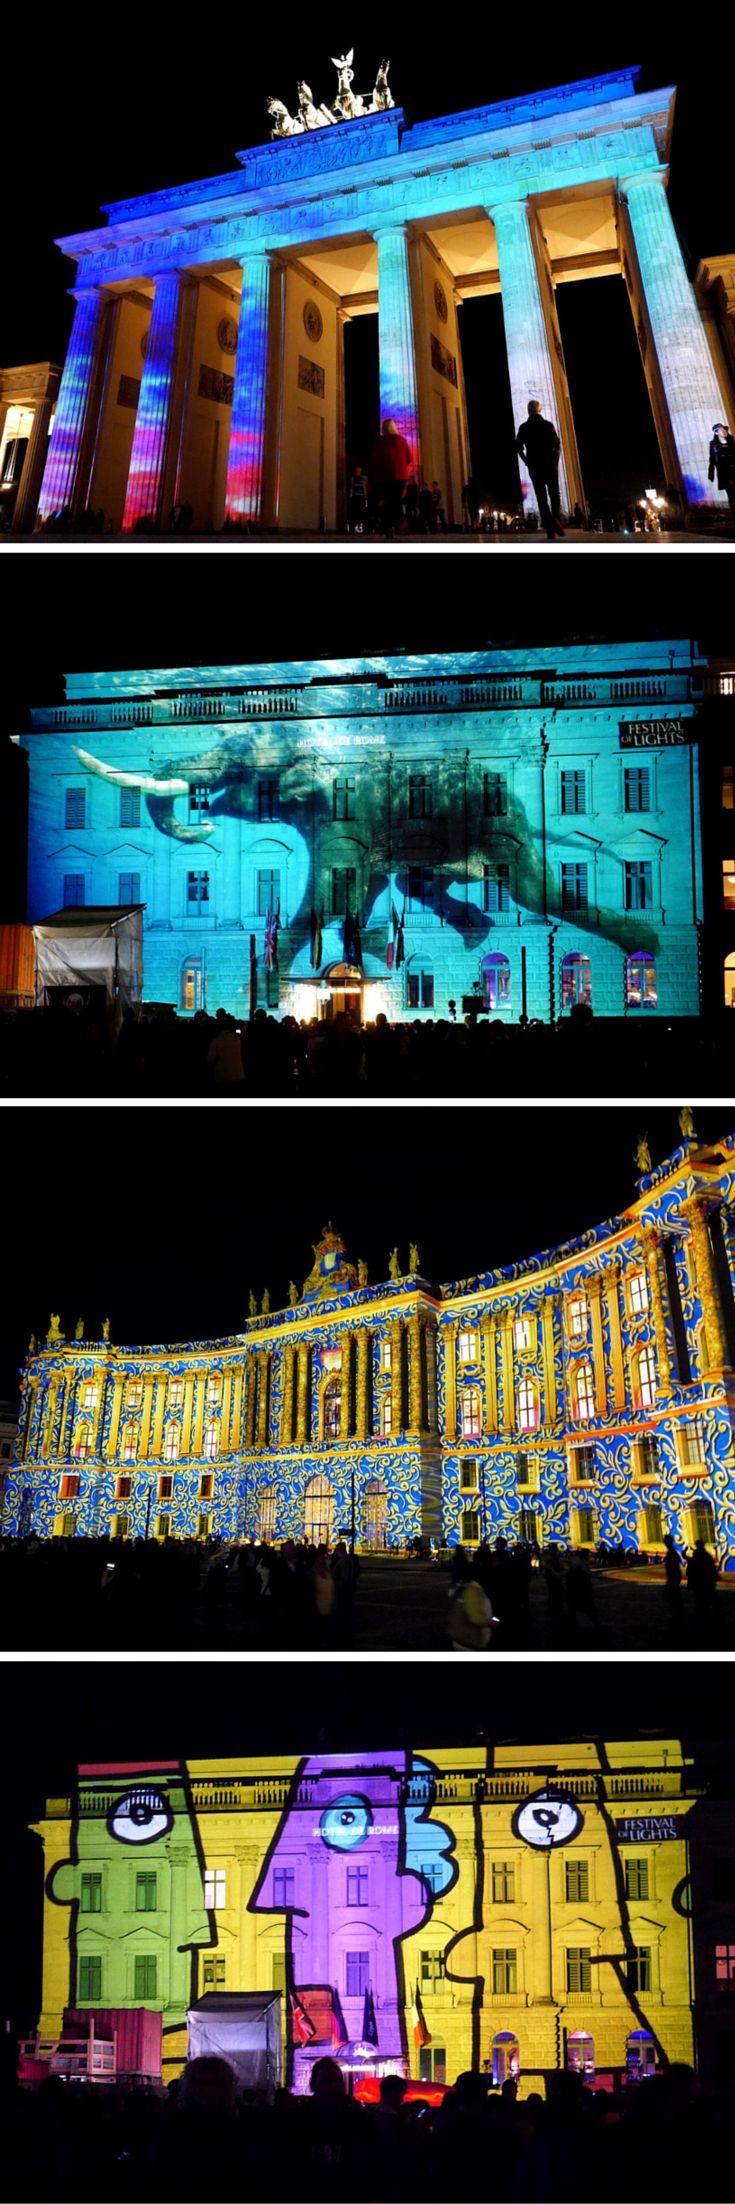 Landmarks illuminated by the Berlin Festival of Lights, Germany